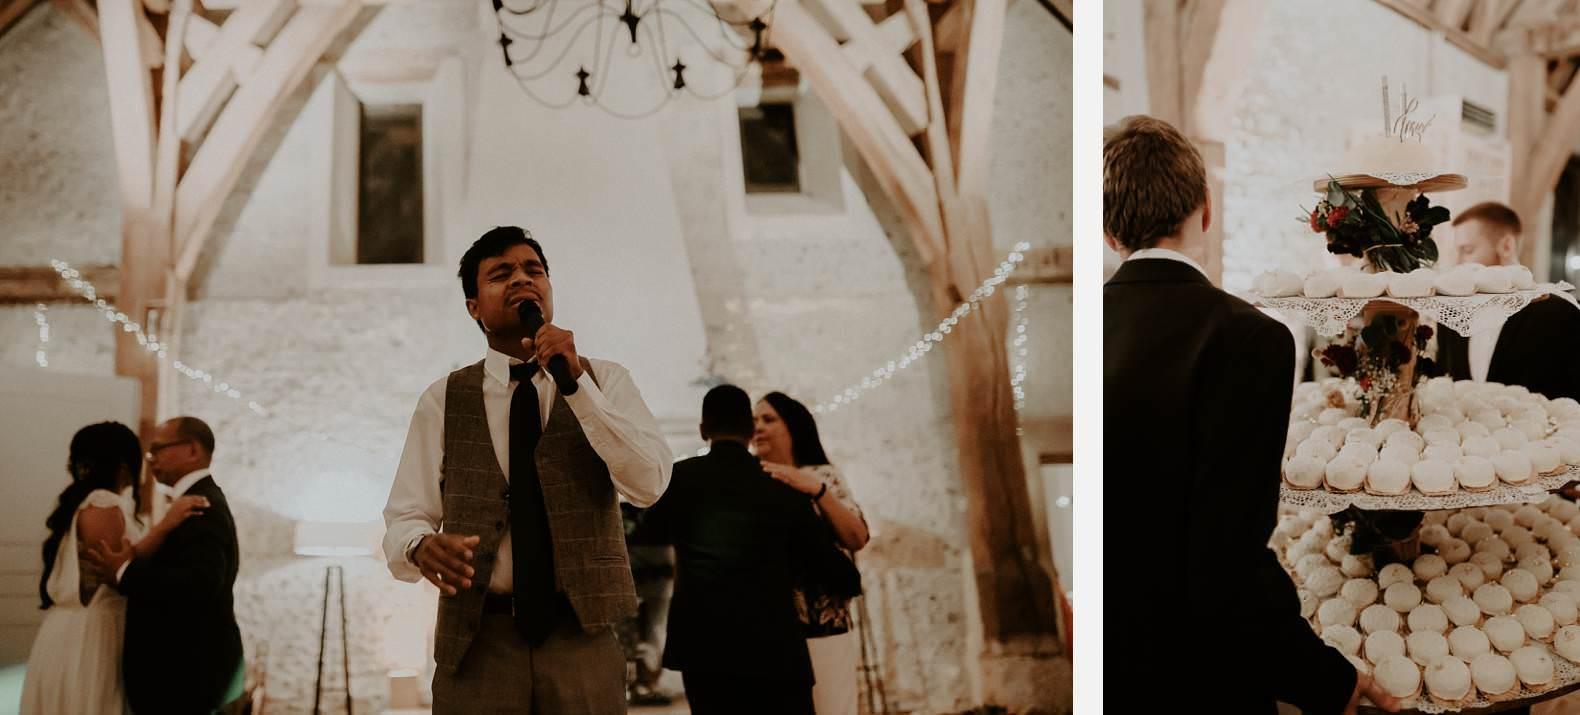 mariage manoir de corny photographe bel esprit 0075 1